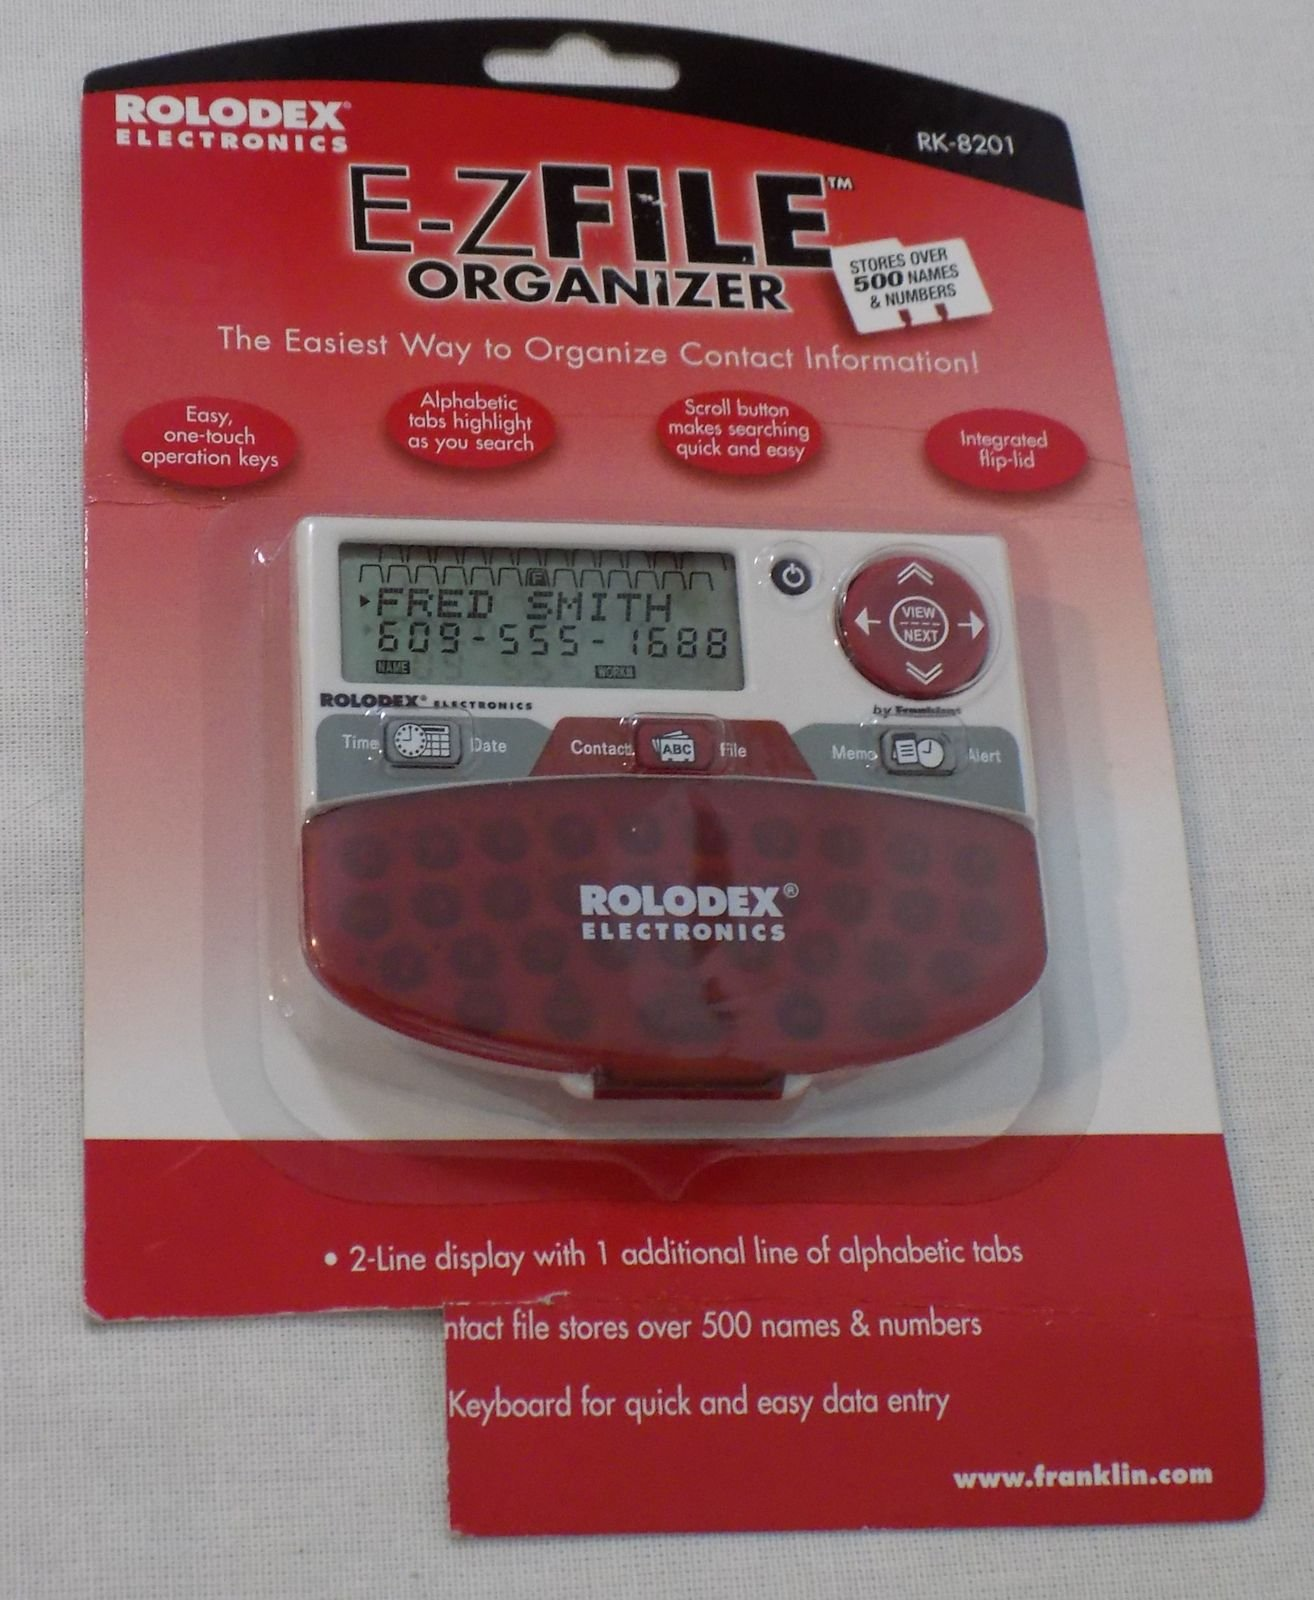 ROLODEX RK-8201 E-Z File Electronic Organizer